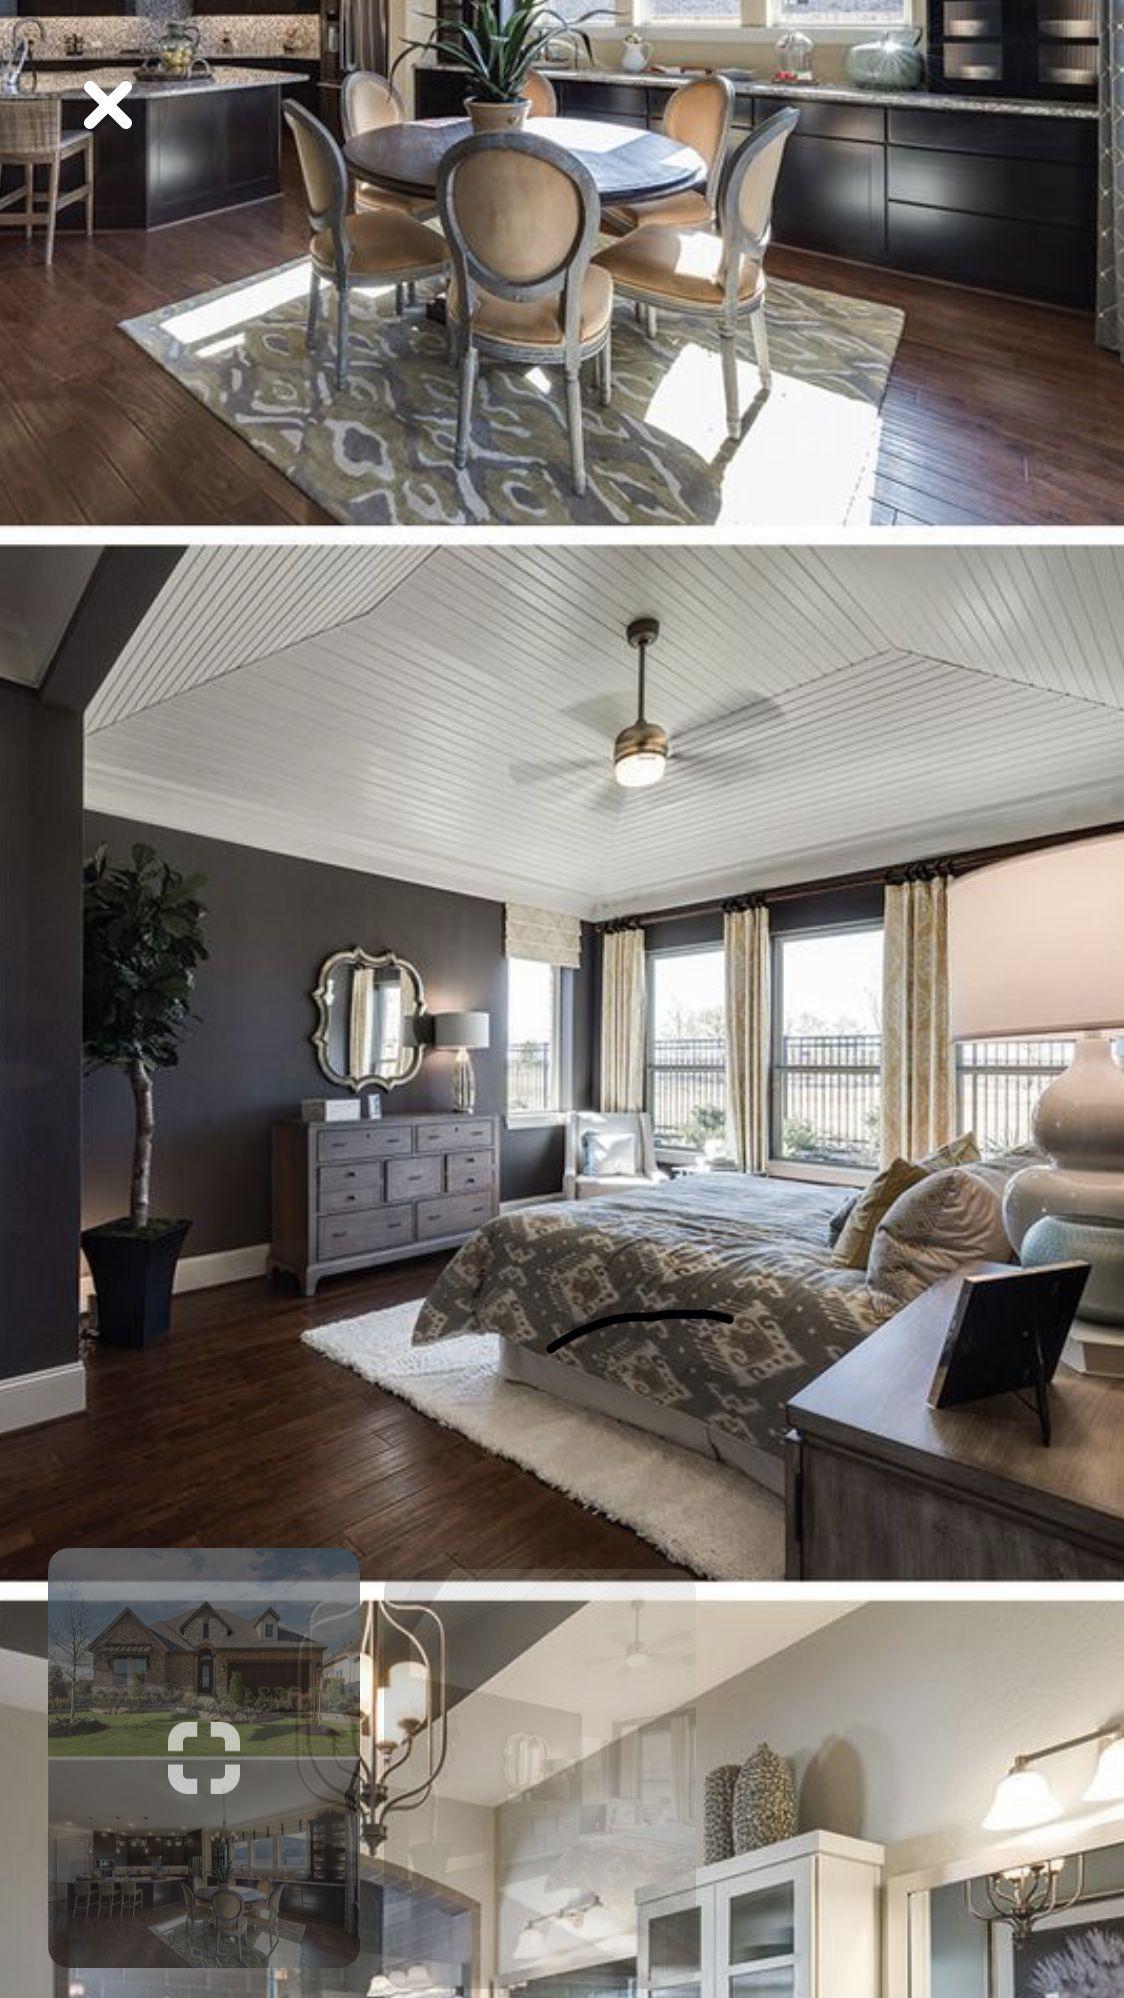 Ceiling | Outdoor decor, Decor, Home decor